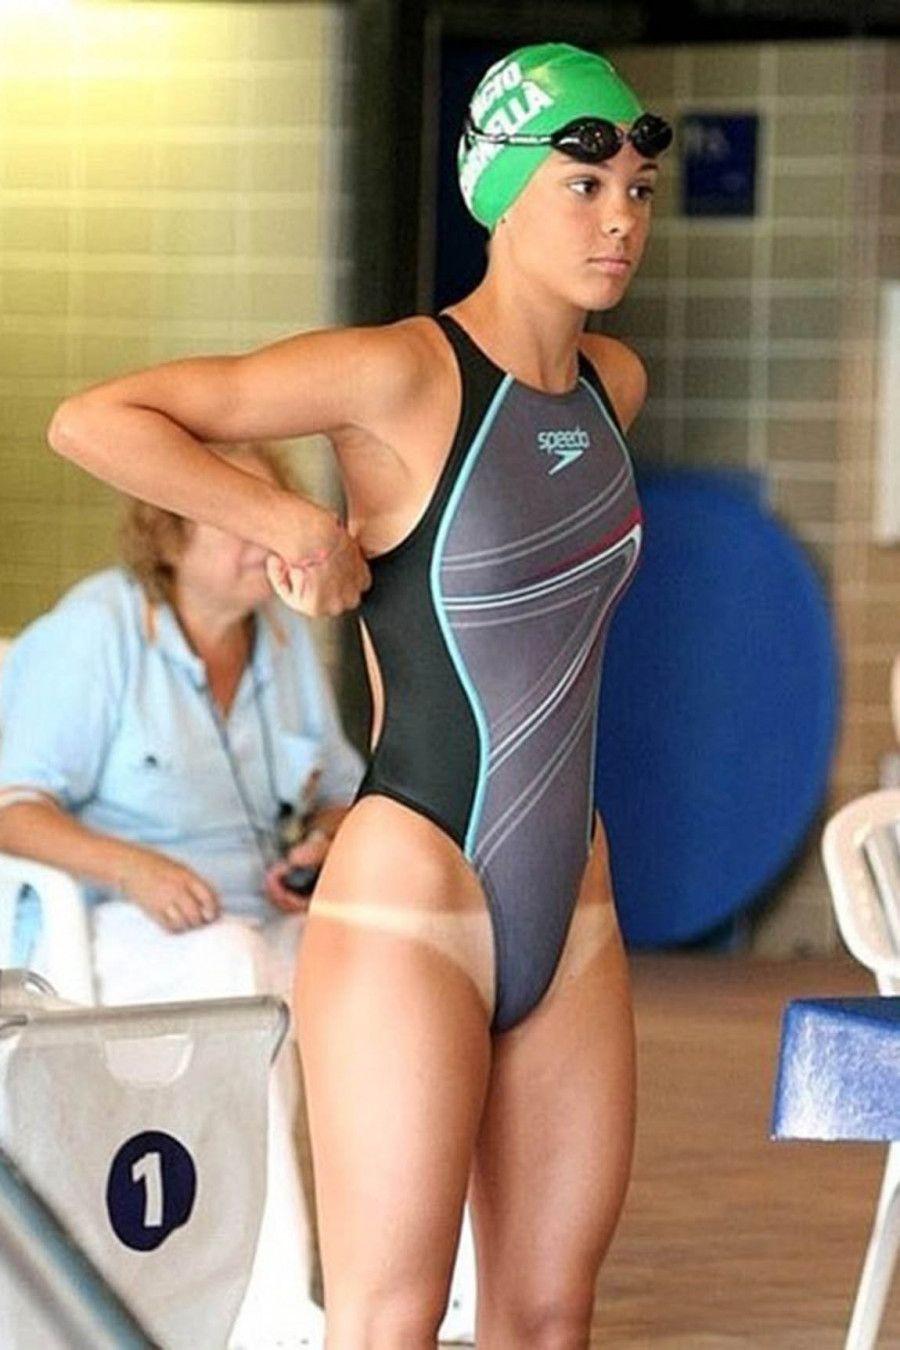 A bikini bottom tan line